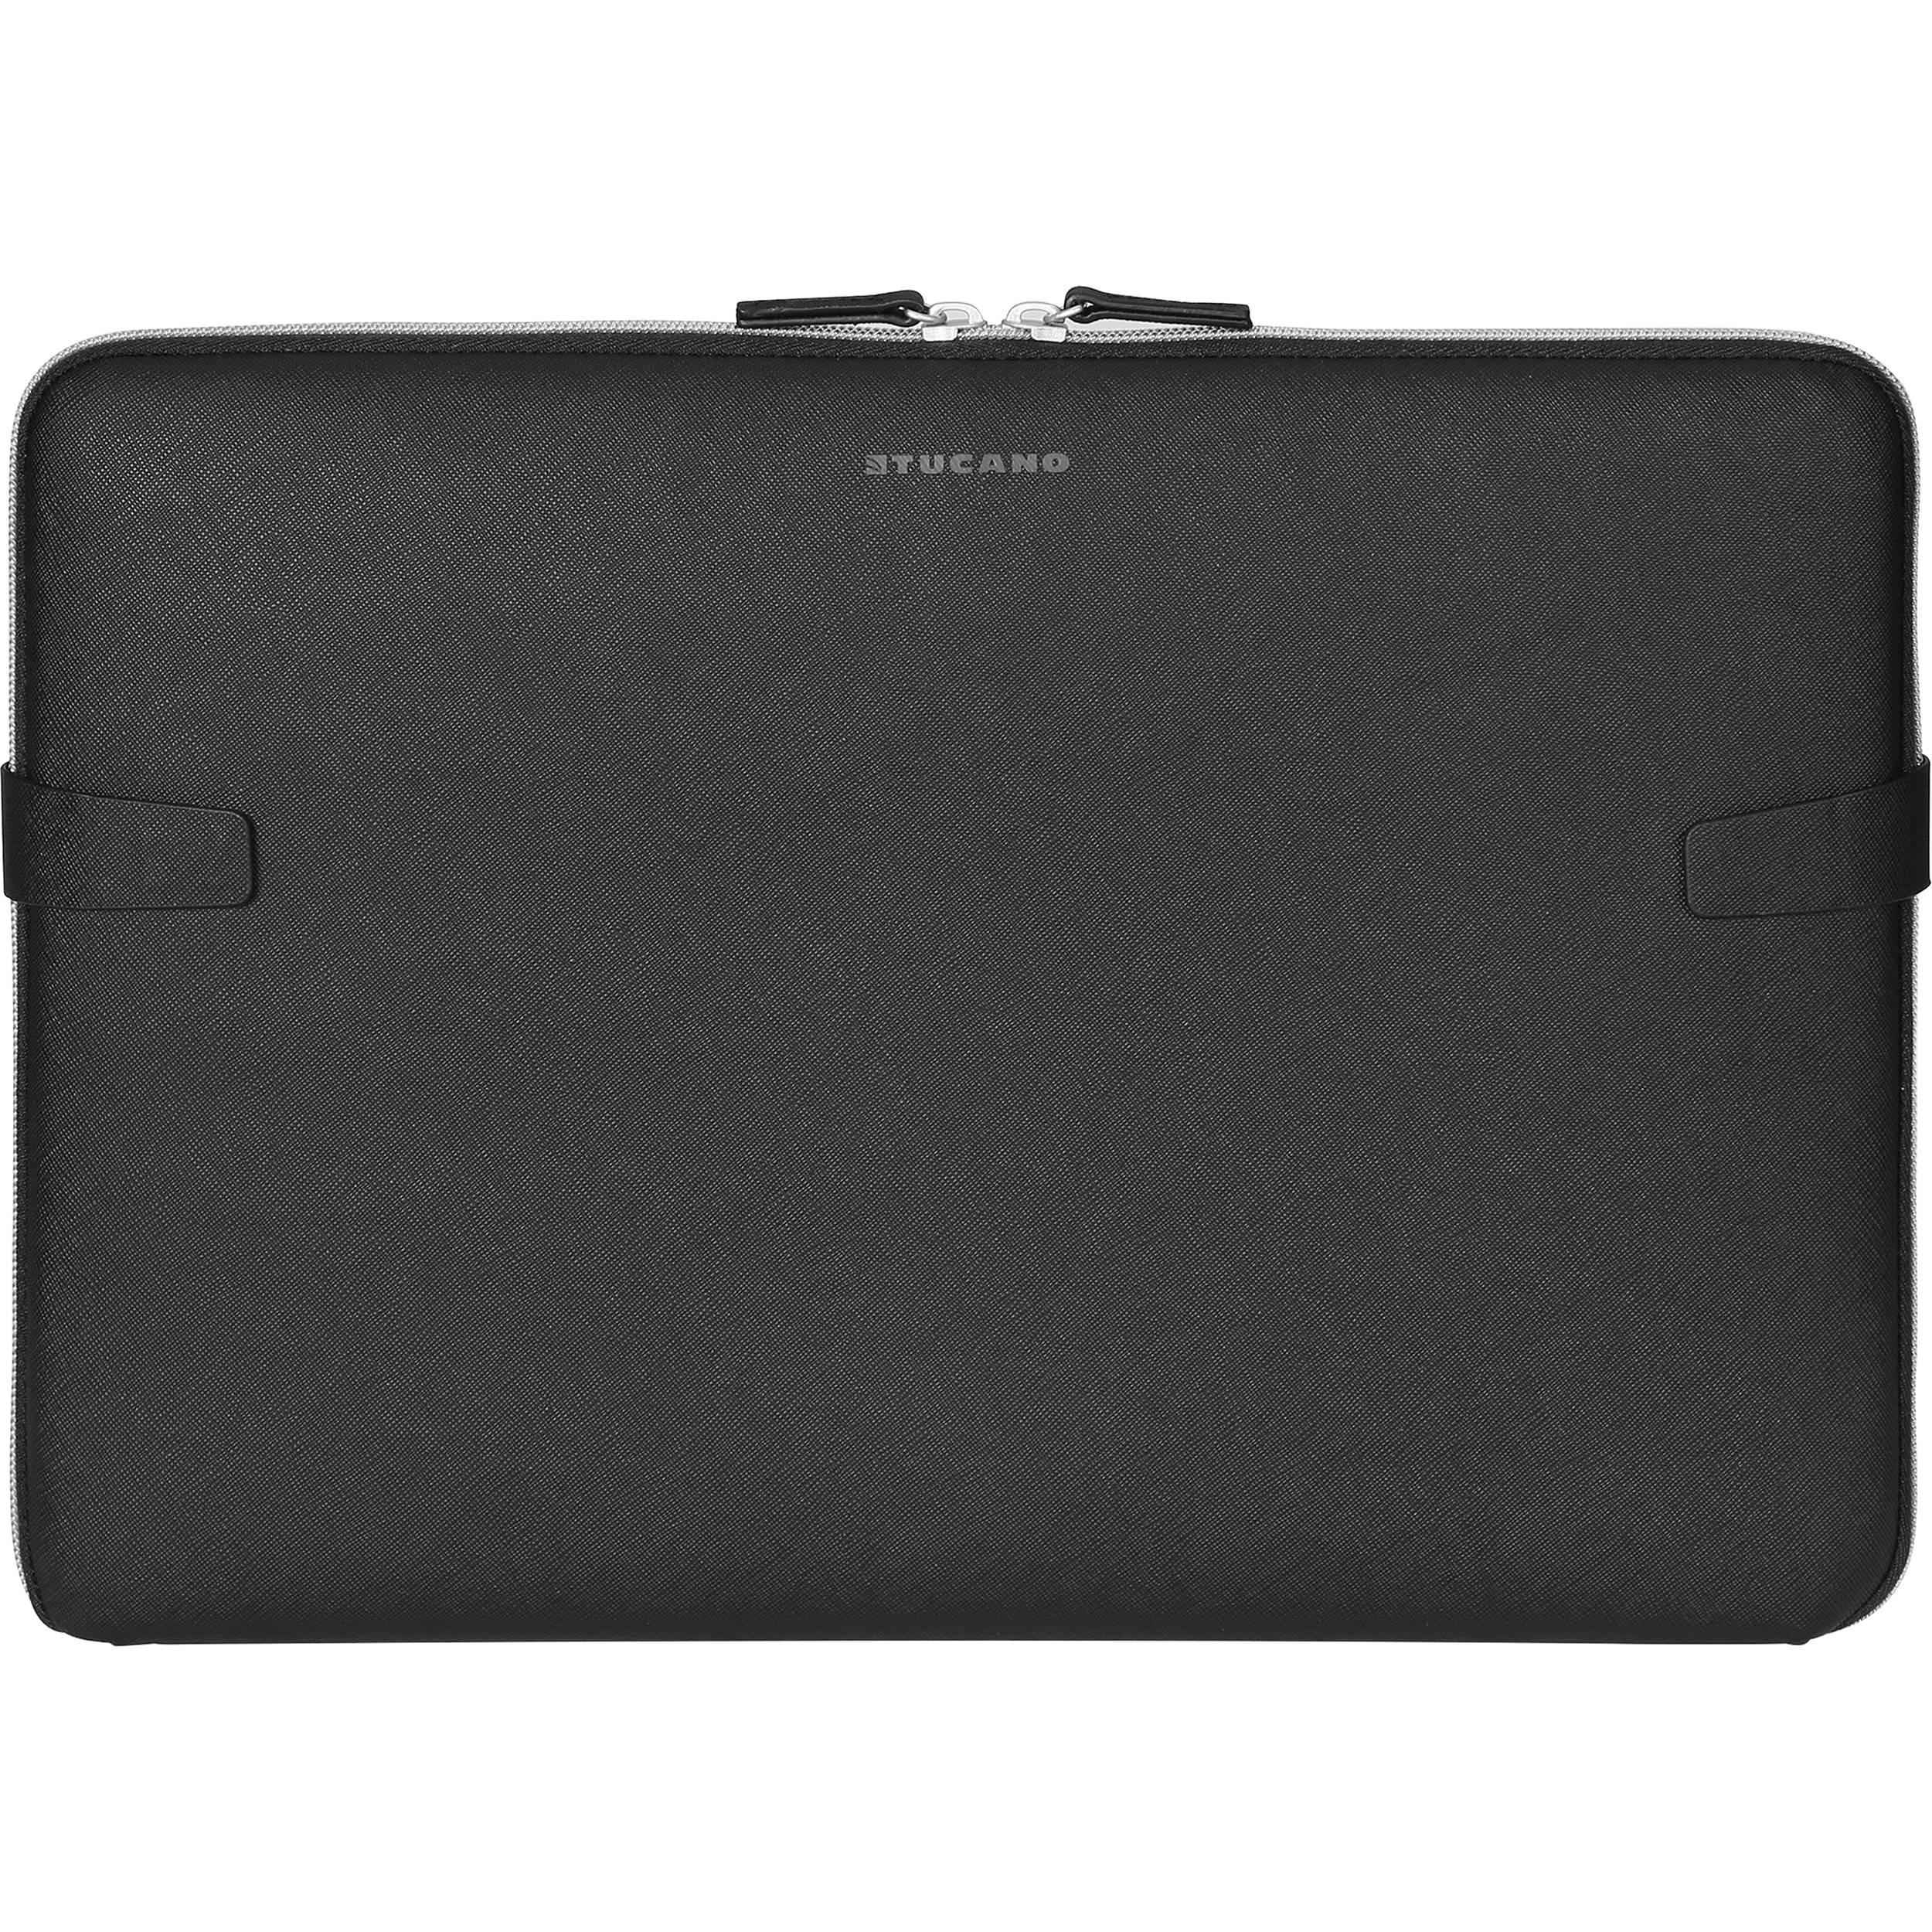 Tucano Velvet Sleeve For Macbook Pro 13 Retina Bf V Mbp13 Bk